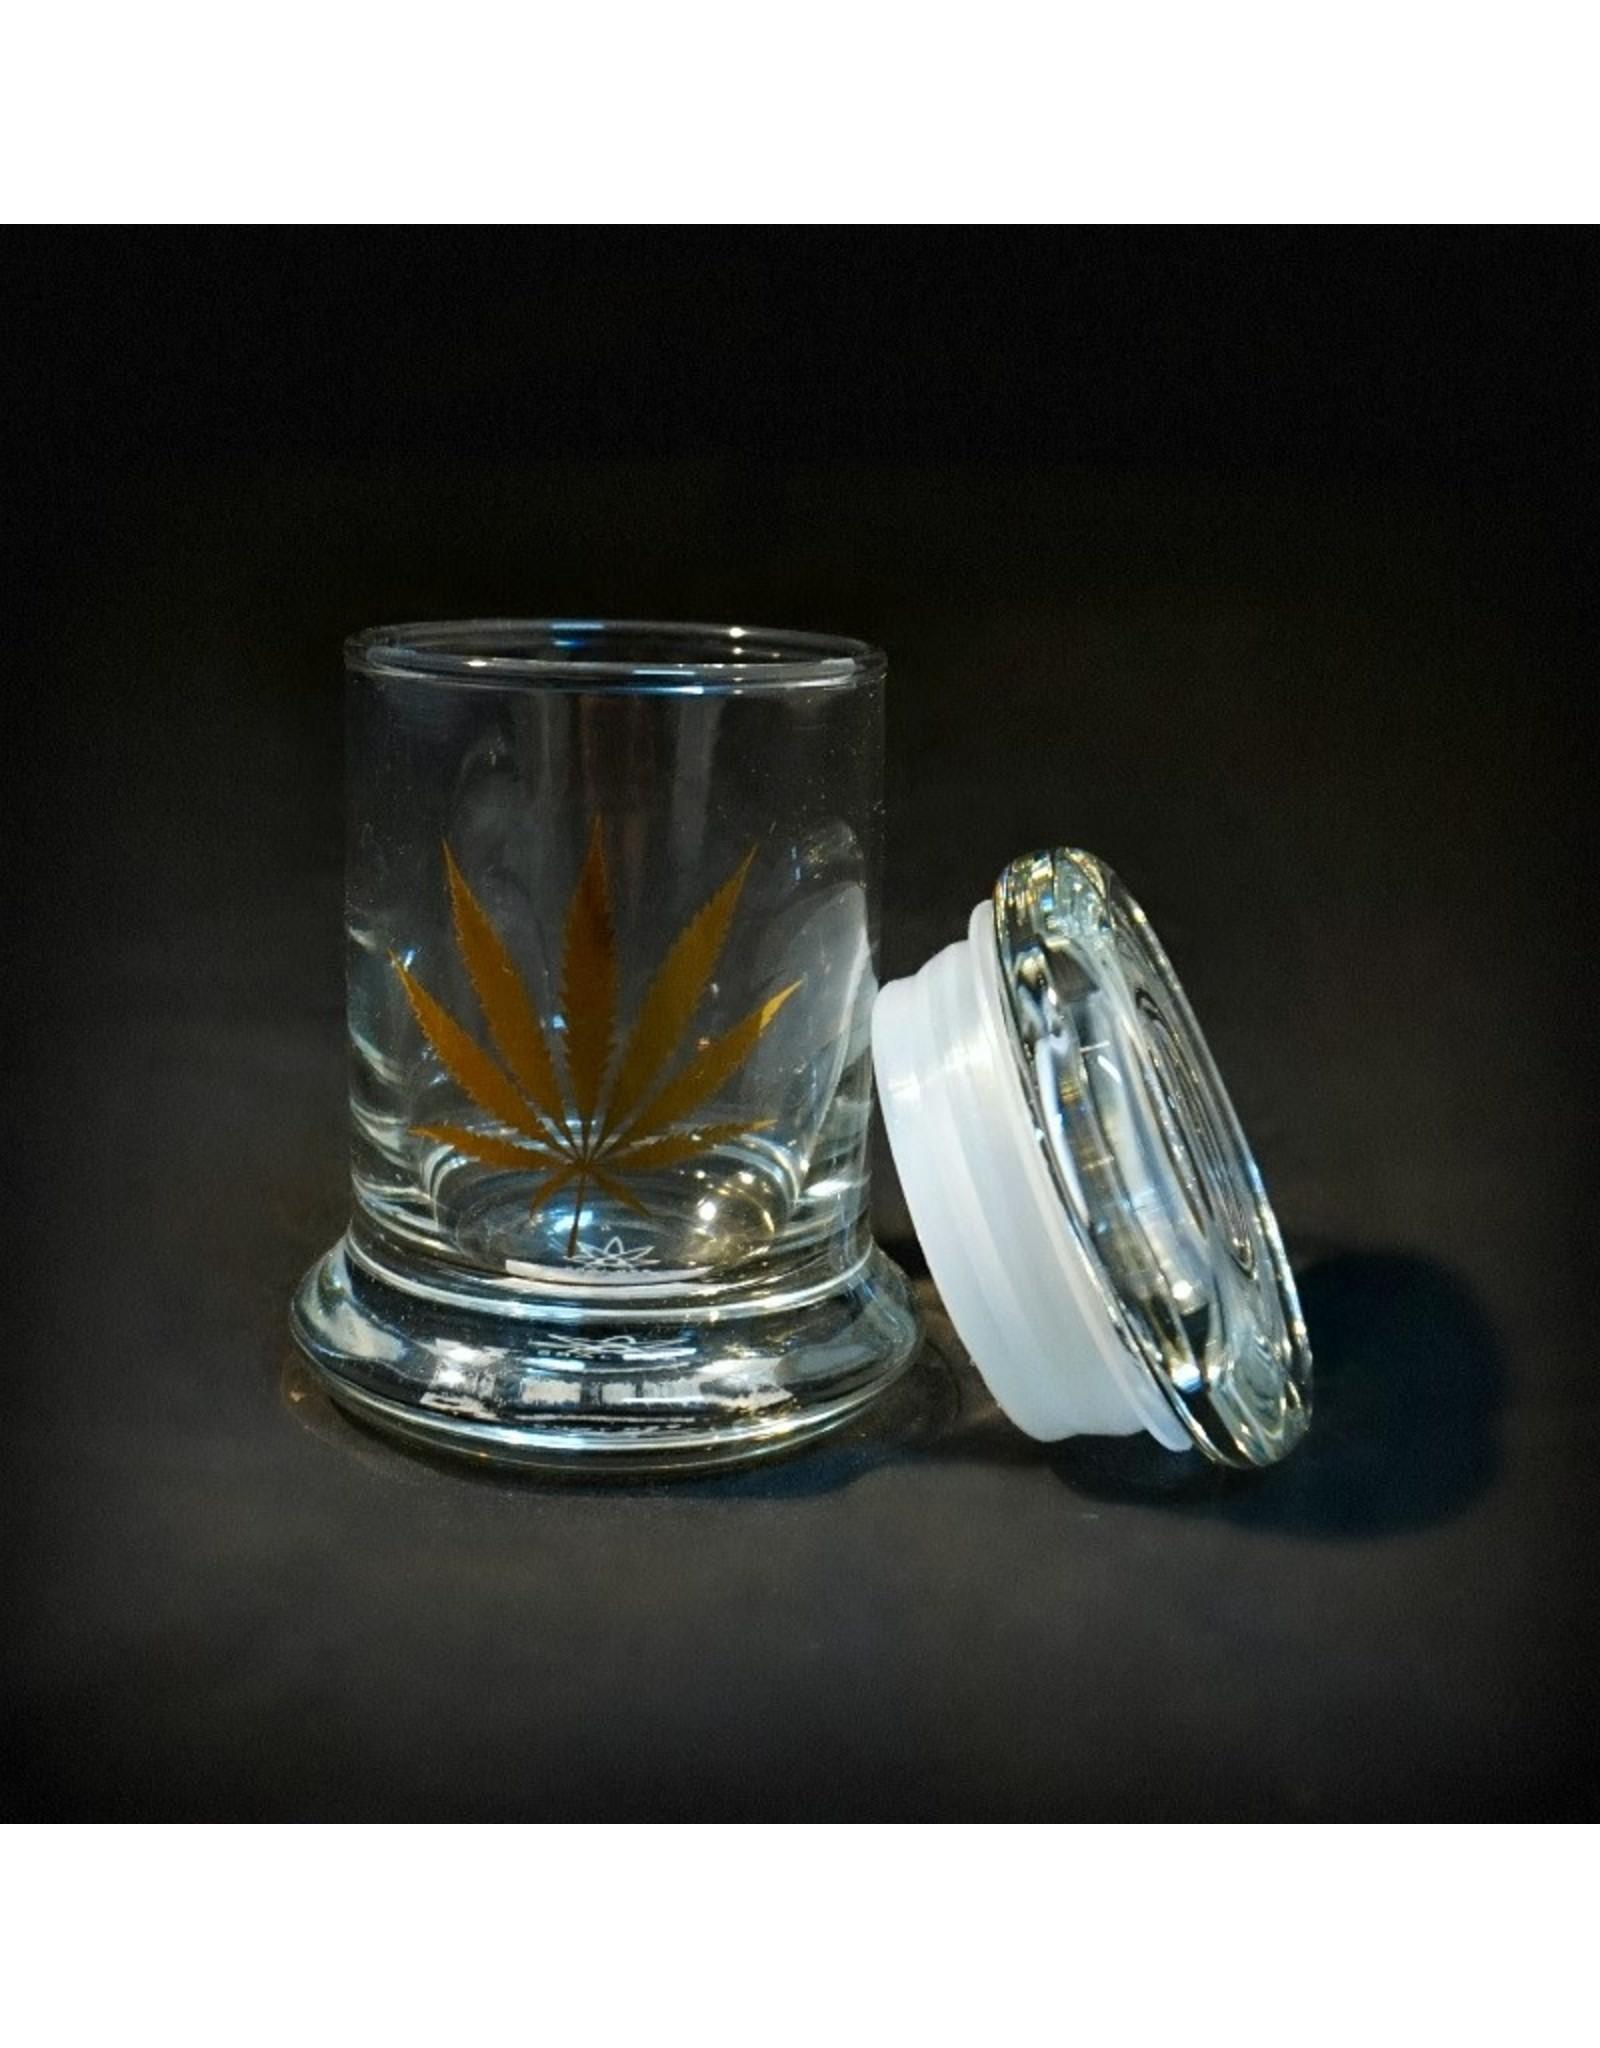 420 Science 420 Science Jars XSmall Gold Leaf Pop Top